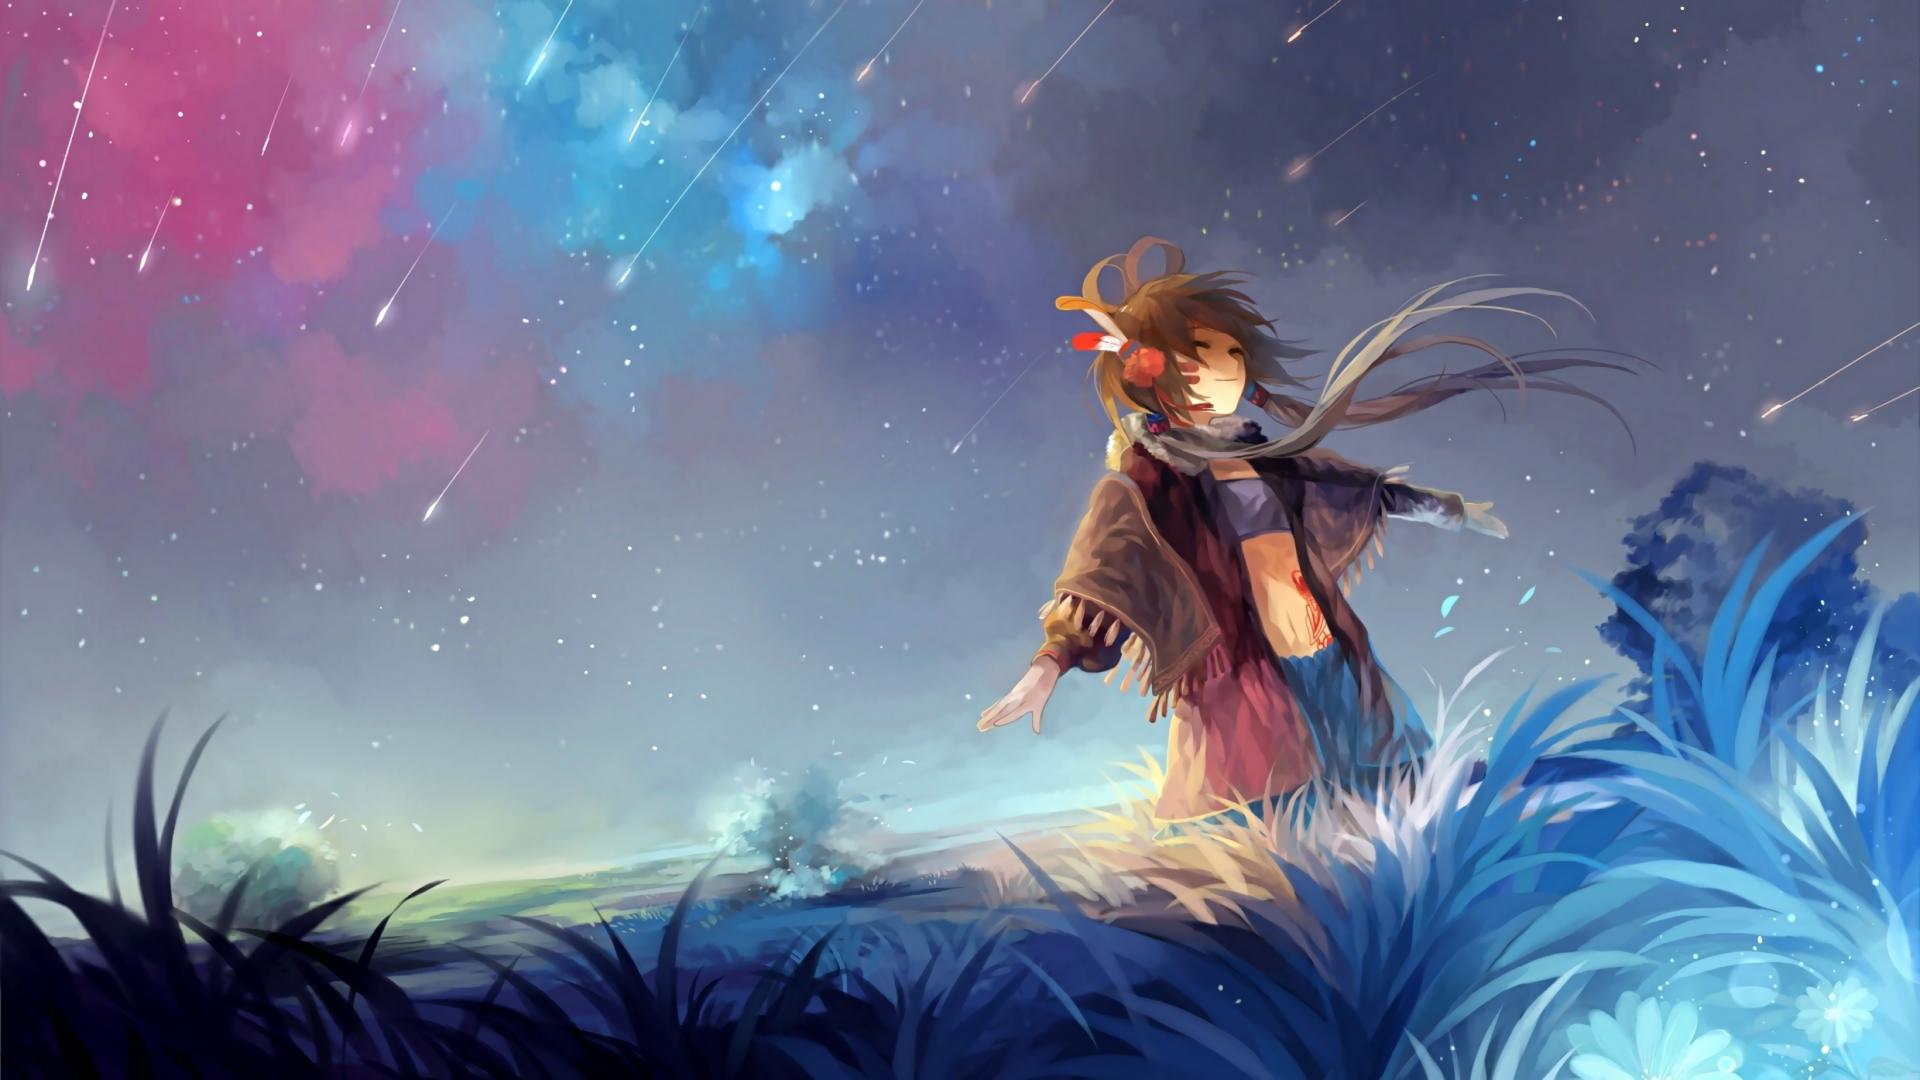 Fond d'écran : Manga, Filles anime, ciel, paysage, étoiles, Anime, venteux, Luo Tianyi, RPG ...